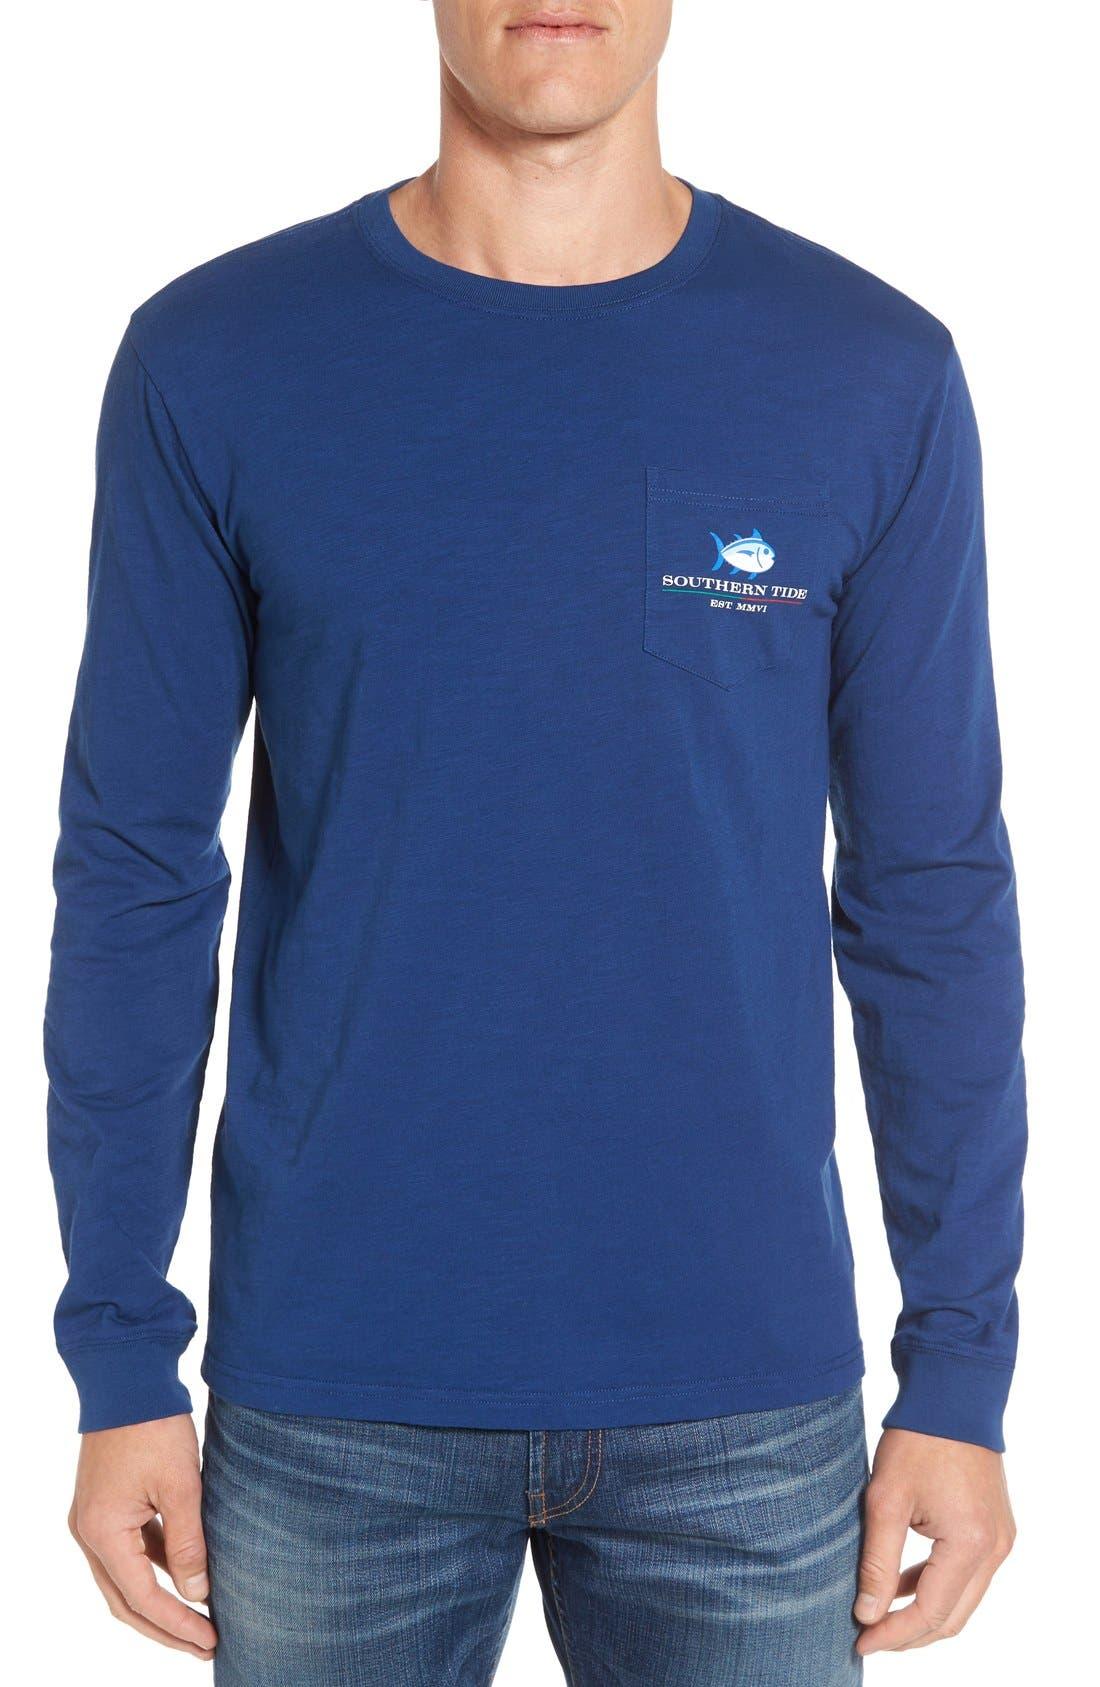 Alternate Image 2  - Southern Tide 'Channel Marker' Graphic Pocket Long Sleeve T-Shirt